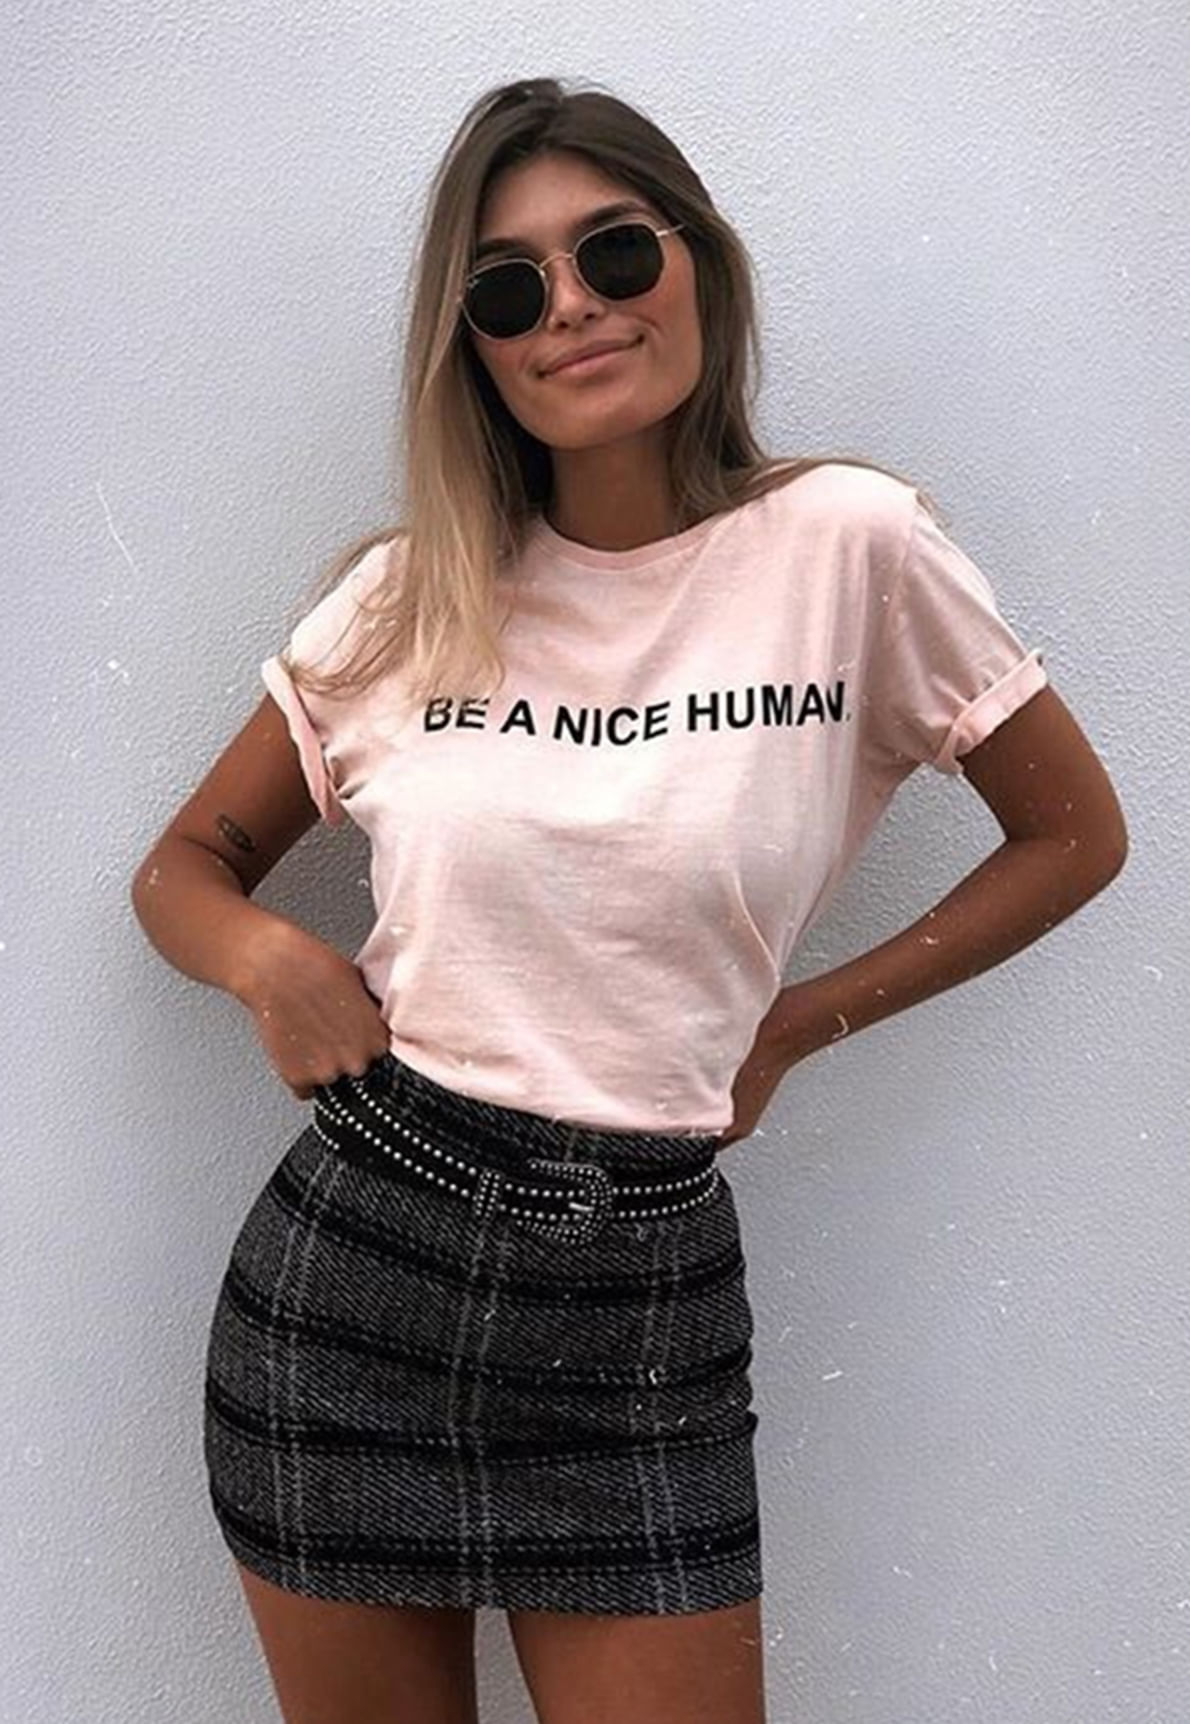 23299-t-shirt-be-a-nice-human-mundo-lolita-02